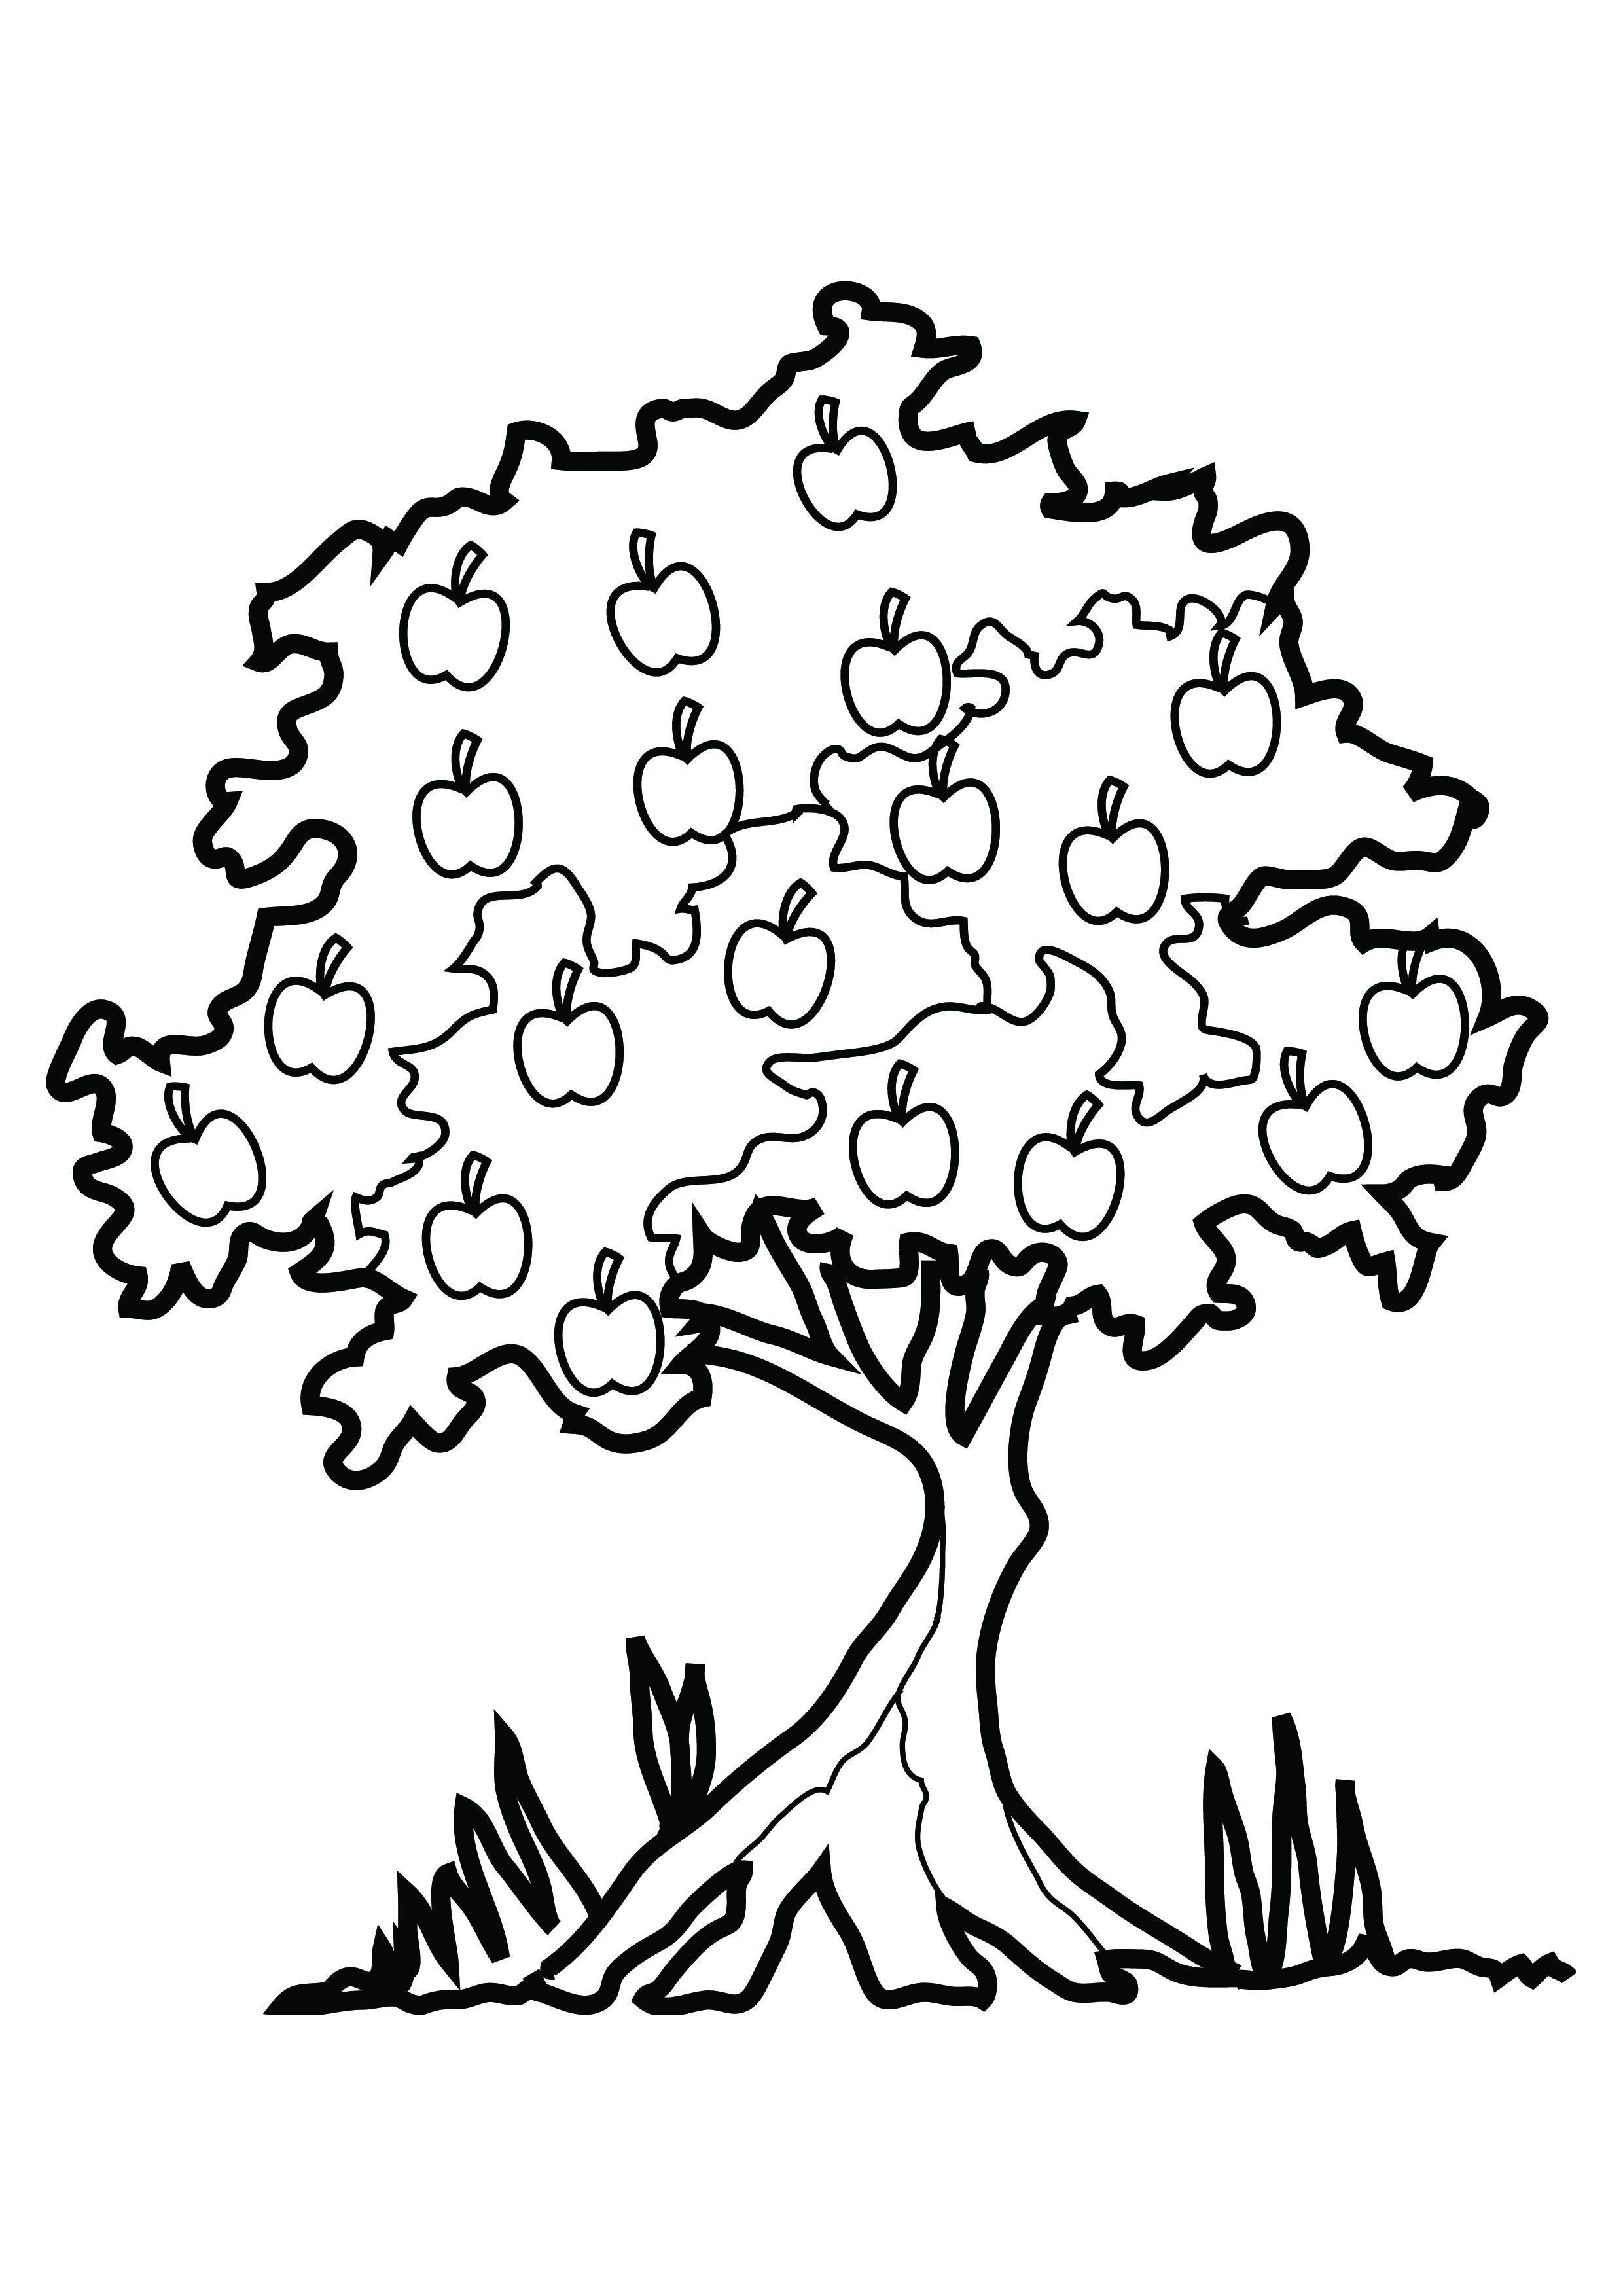 Autumn Tree Drawing At Getdrawings